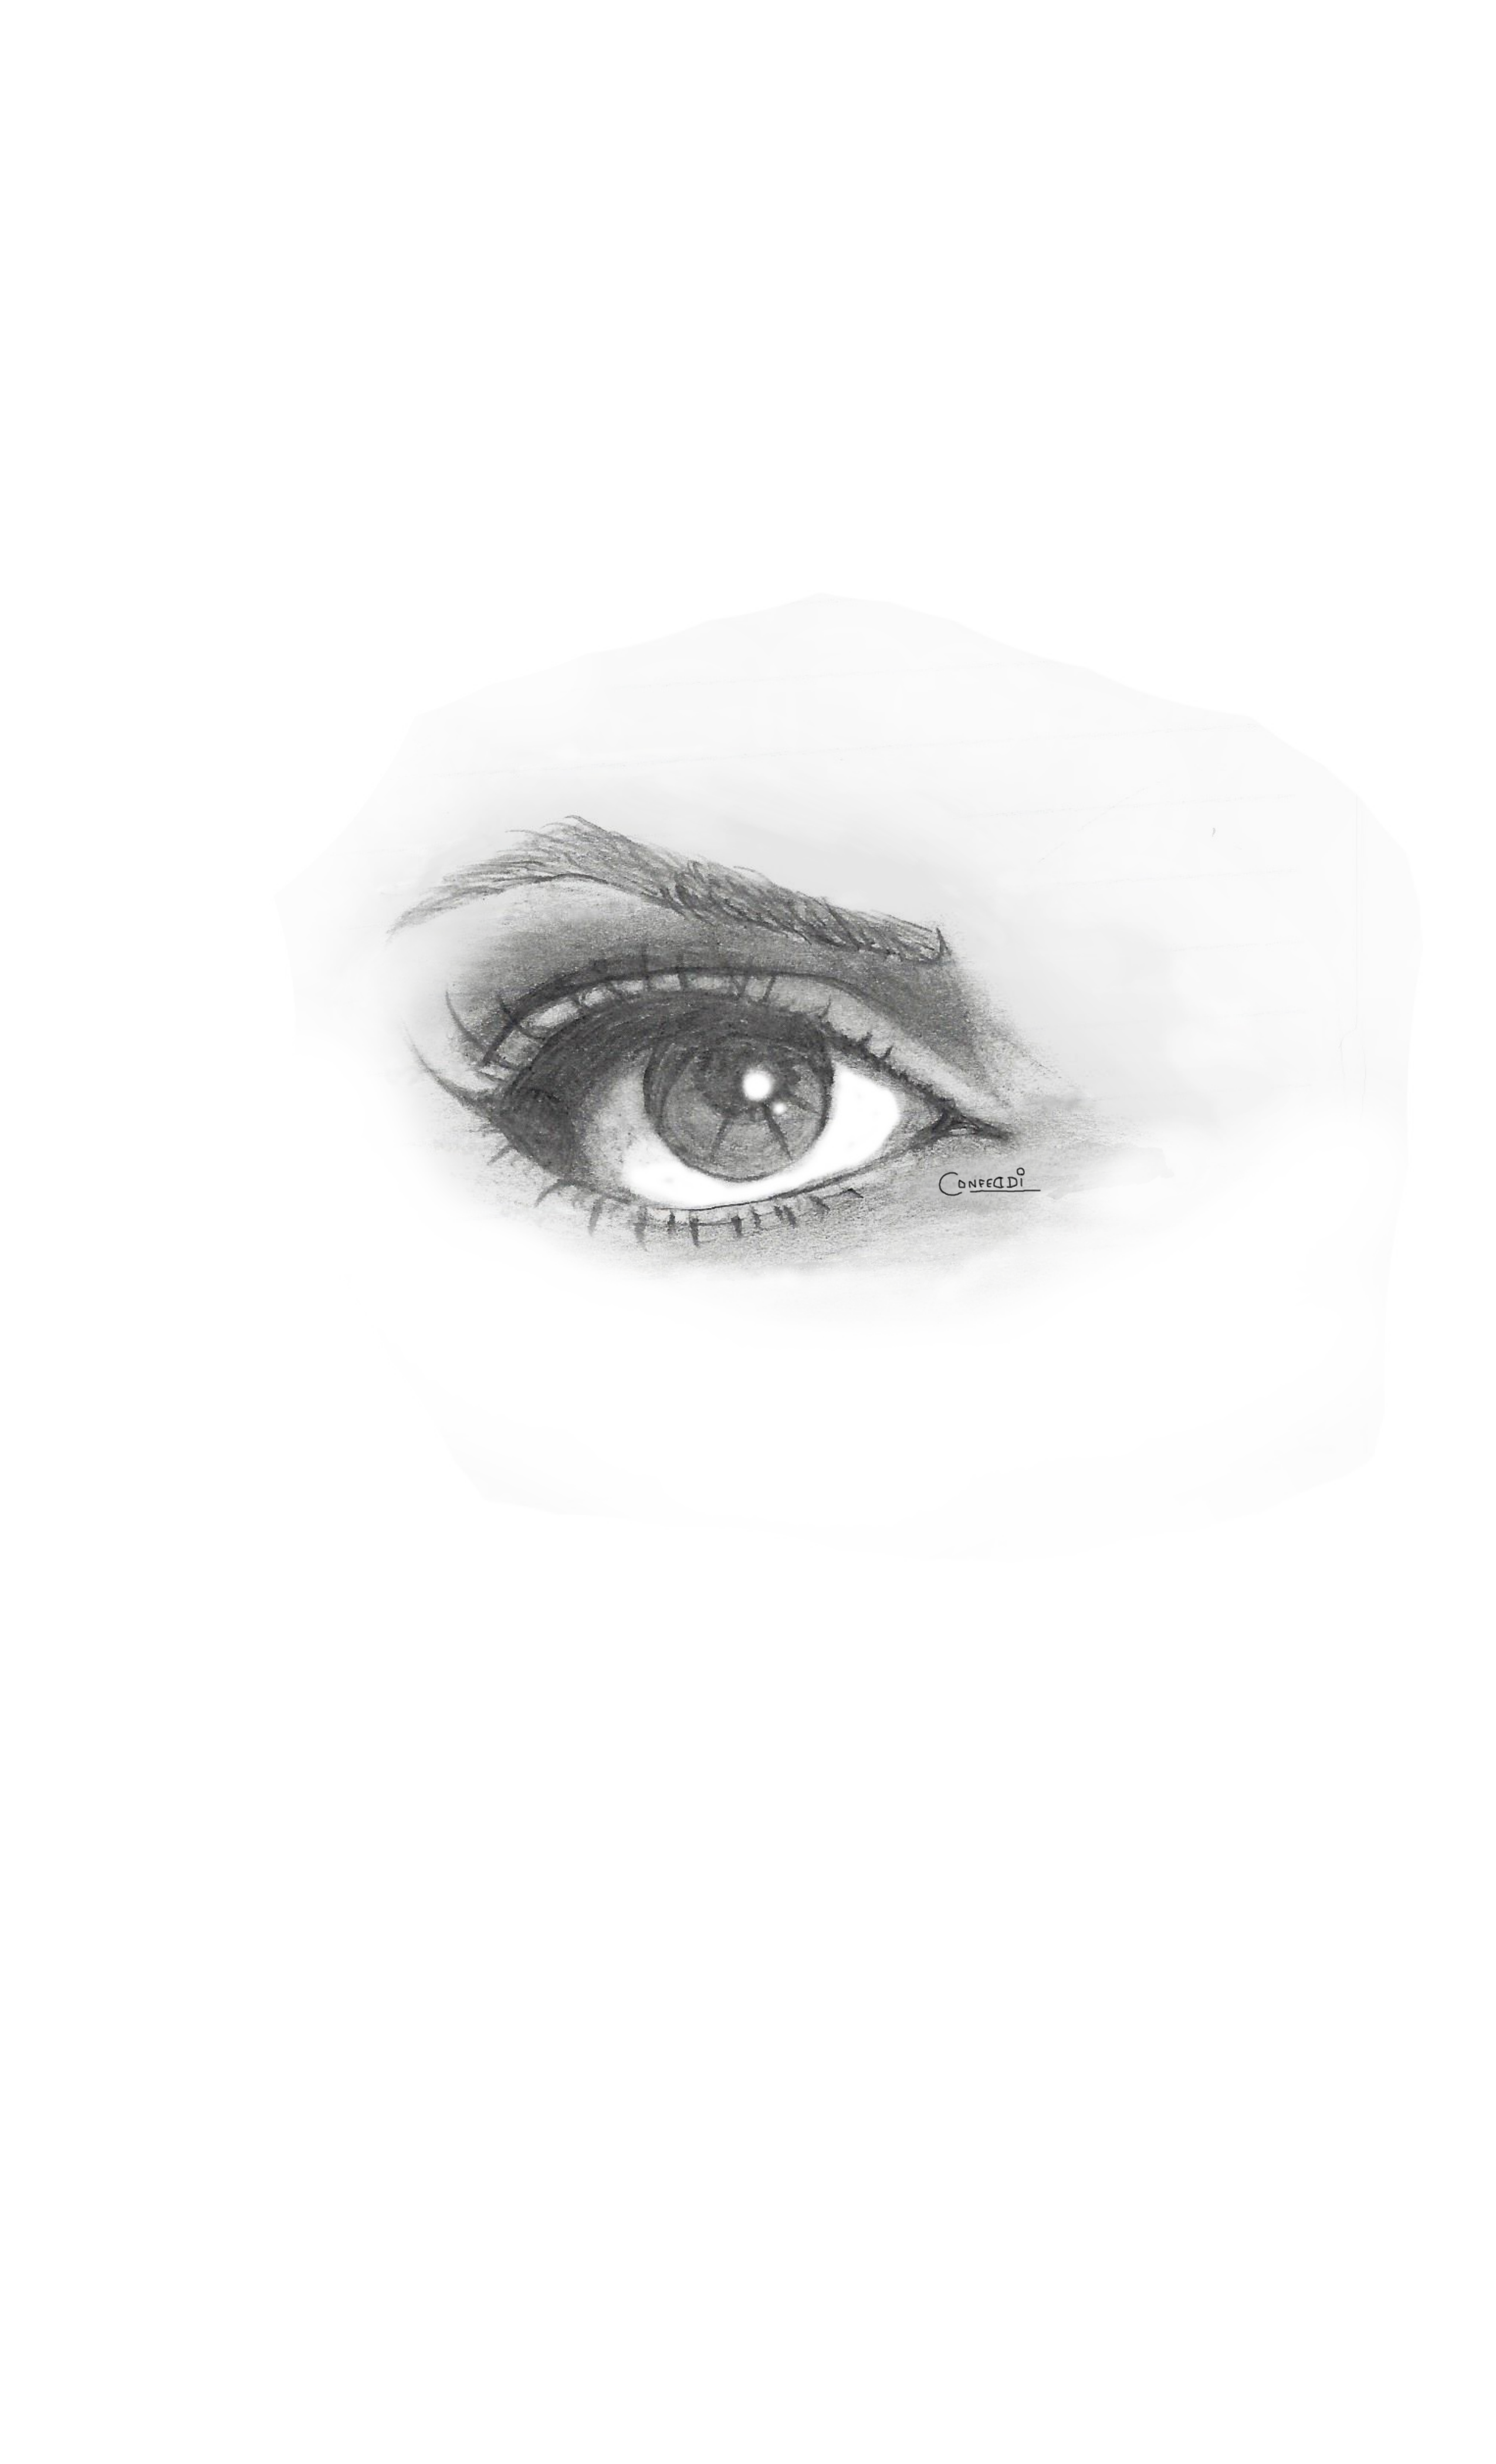 Realistic Eye (better version)